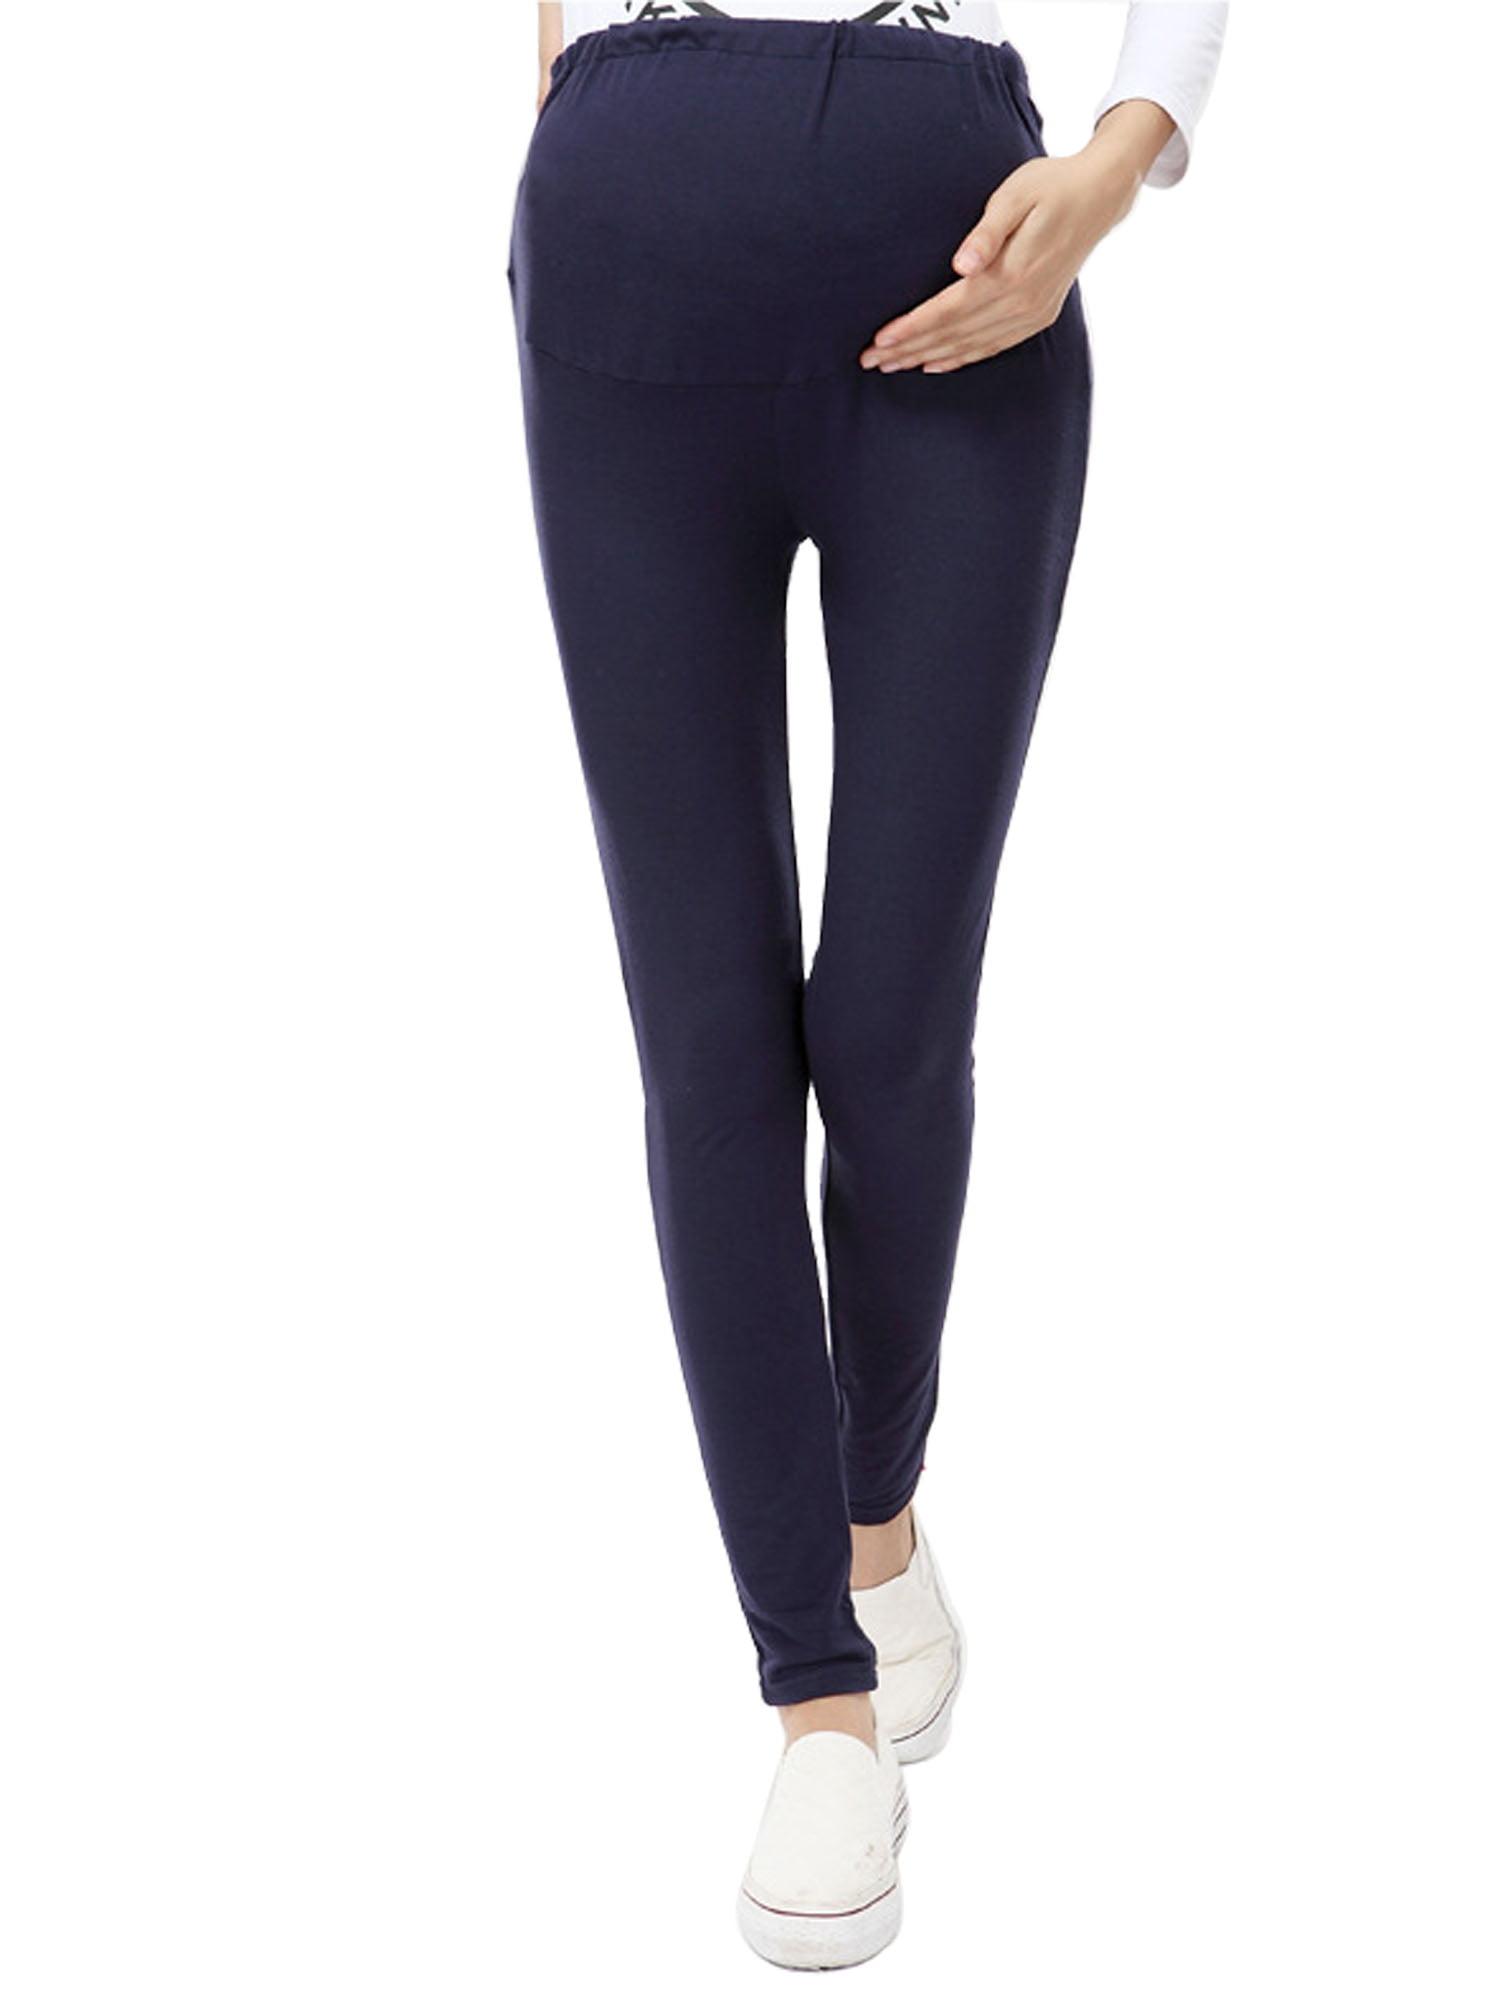 Fit Stretch Over Bump Maternity Pregnancy Leggings, 7397_Dark Blue